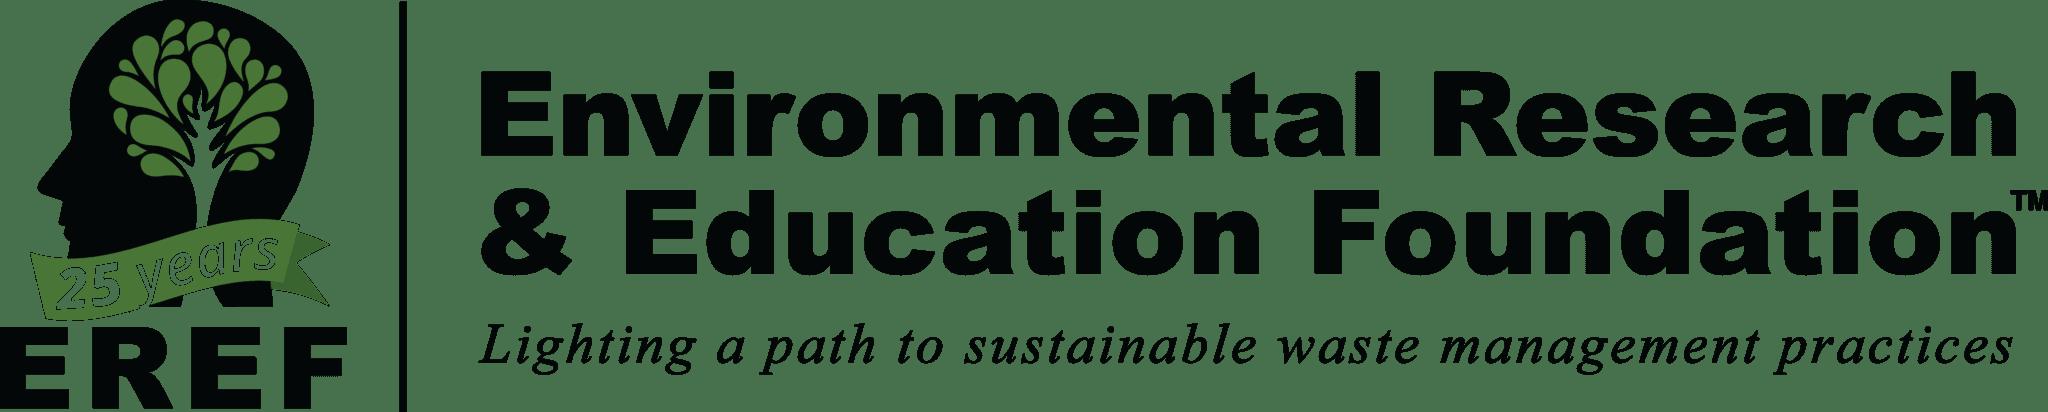 EREF Education